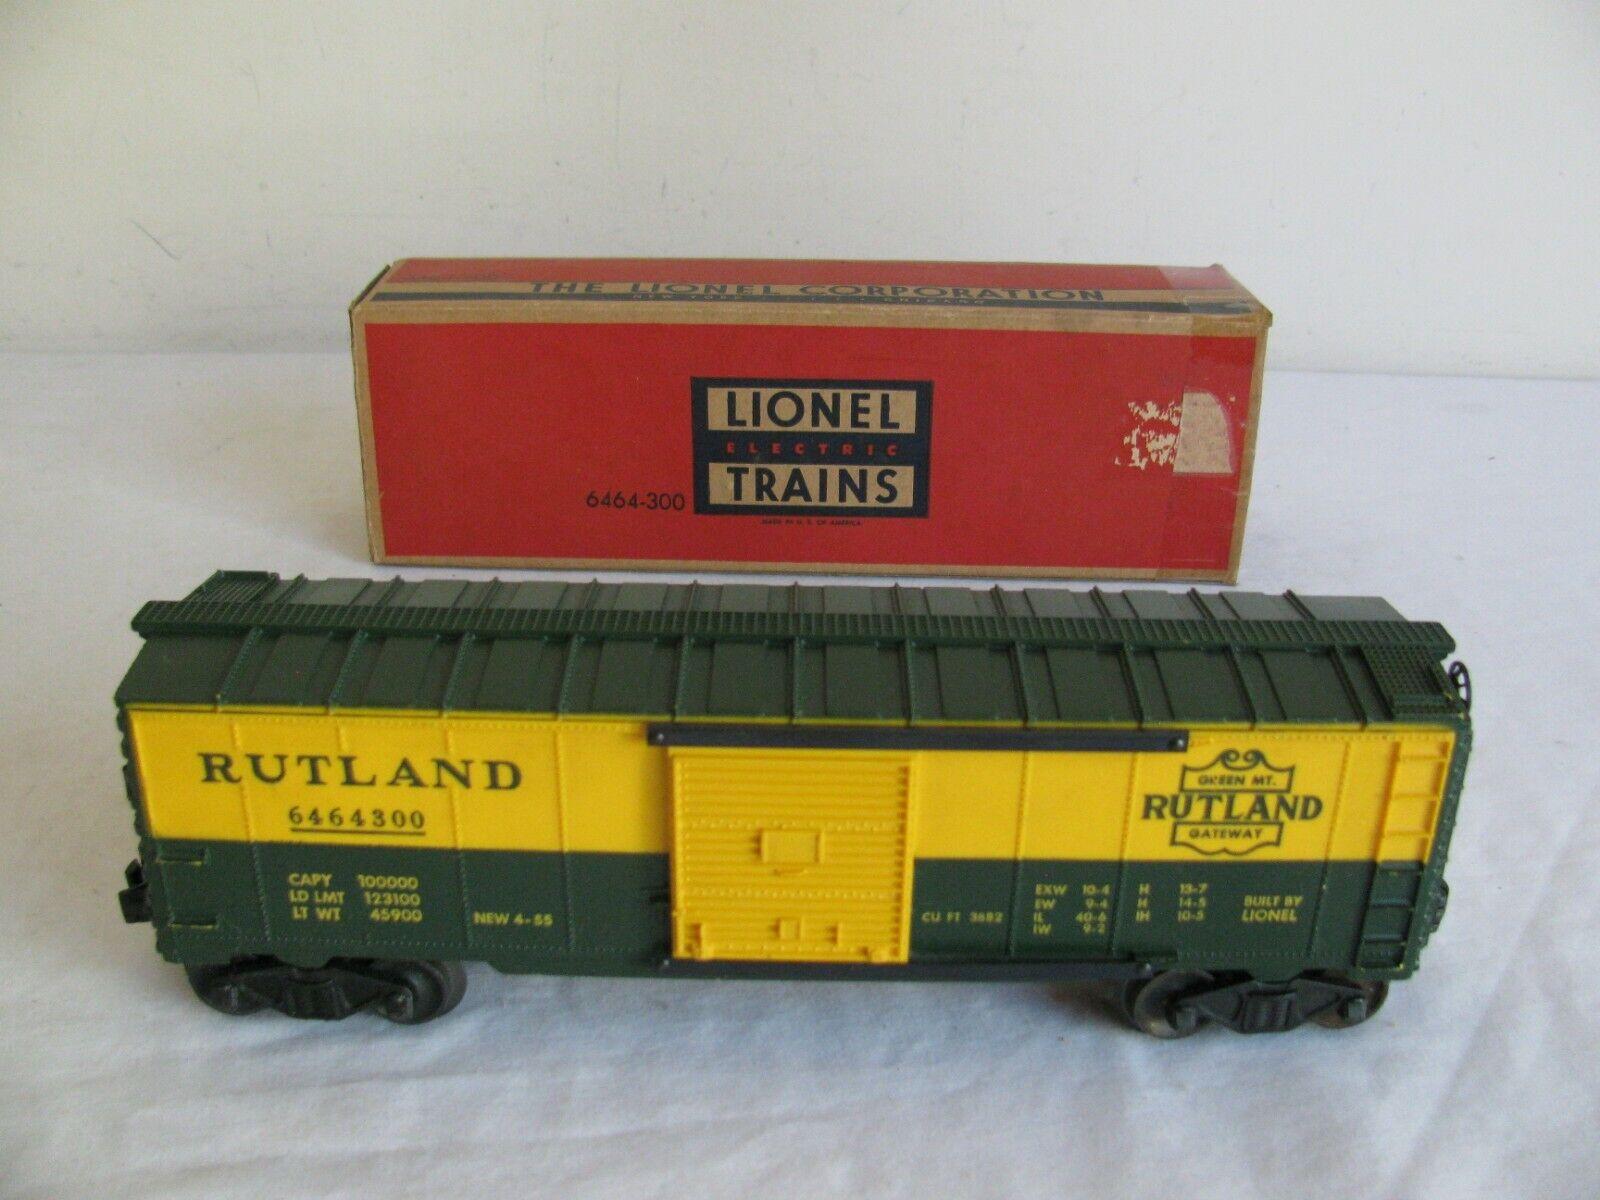 Vintage Trenes Lionel O O-27 escala Rutland Gateway coche de caja  6464-300 Muy Buen